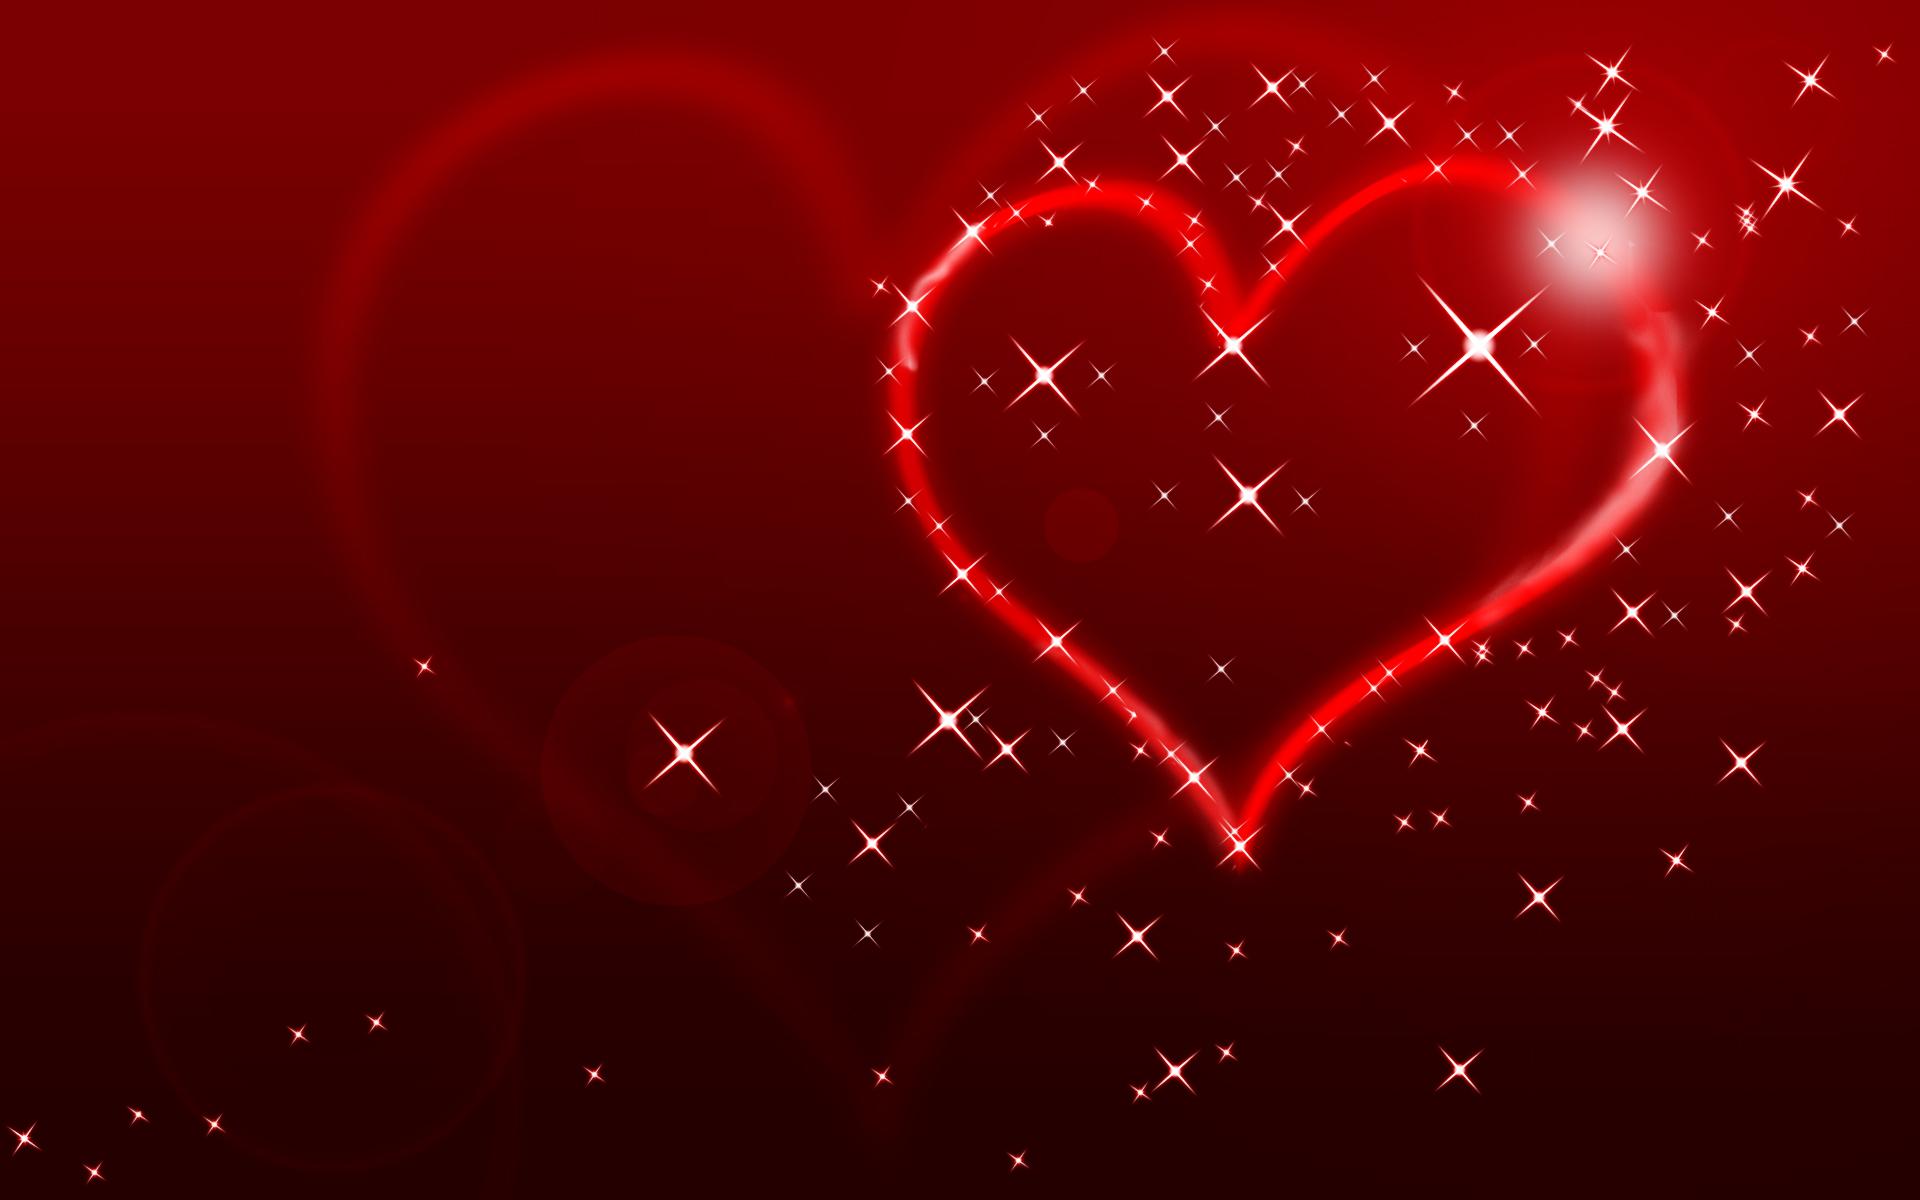 D Wallpaper Valentines Wallpapers Free Pixelstalk Net